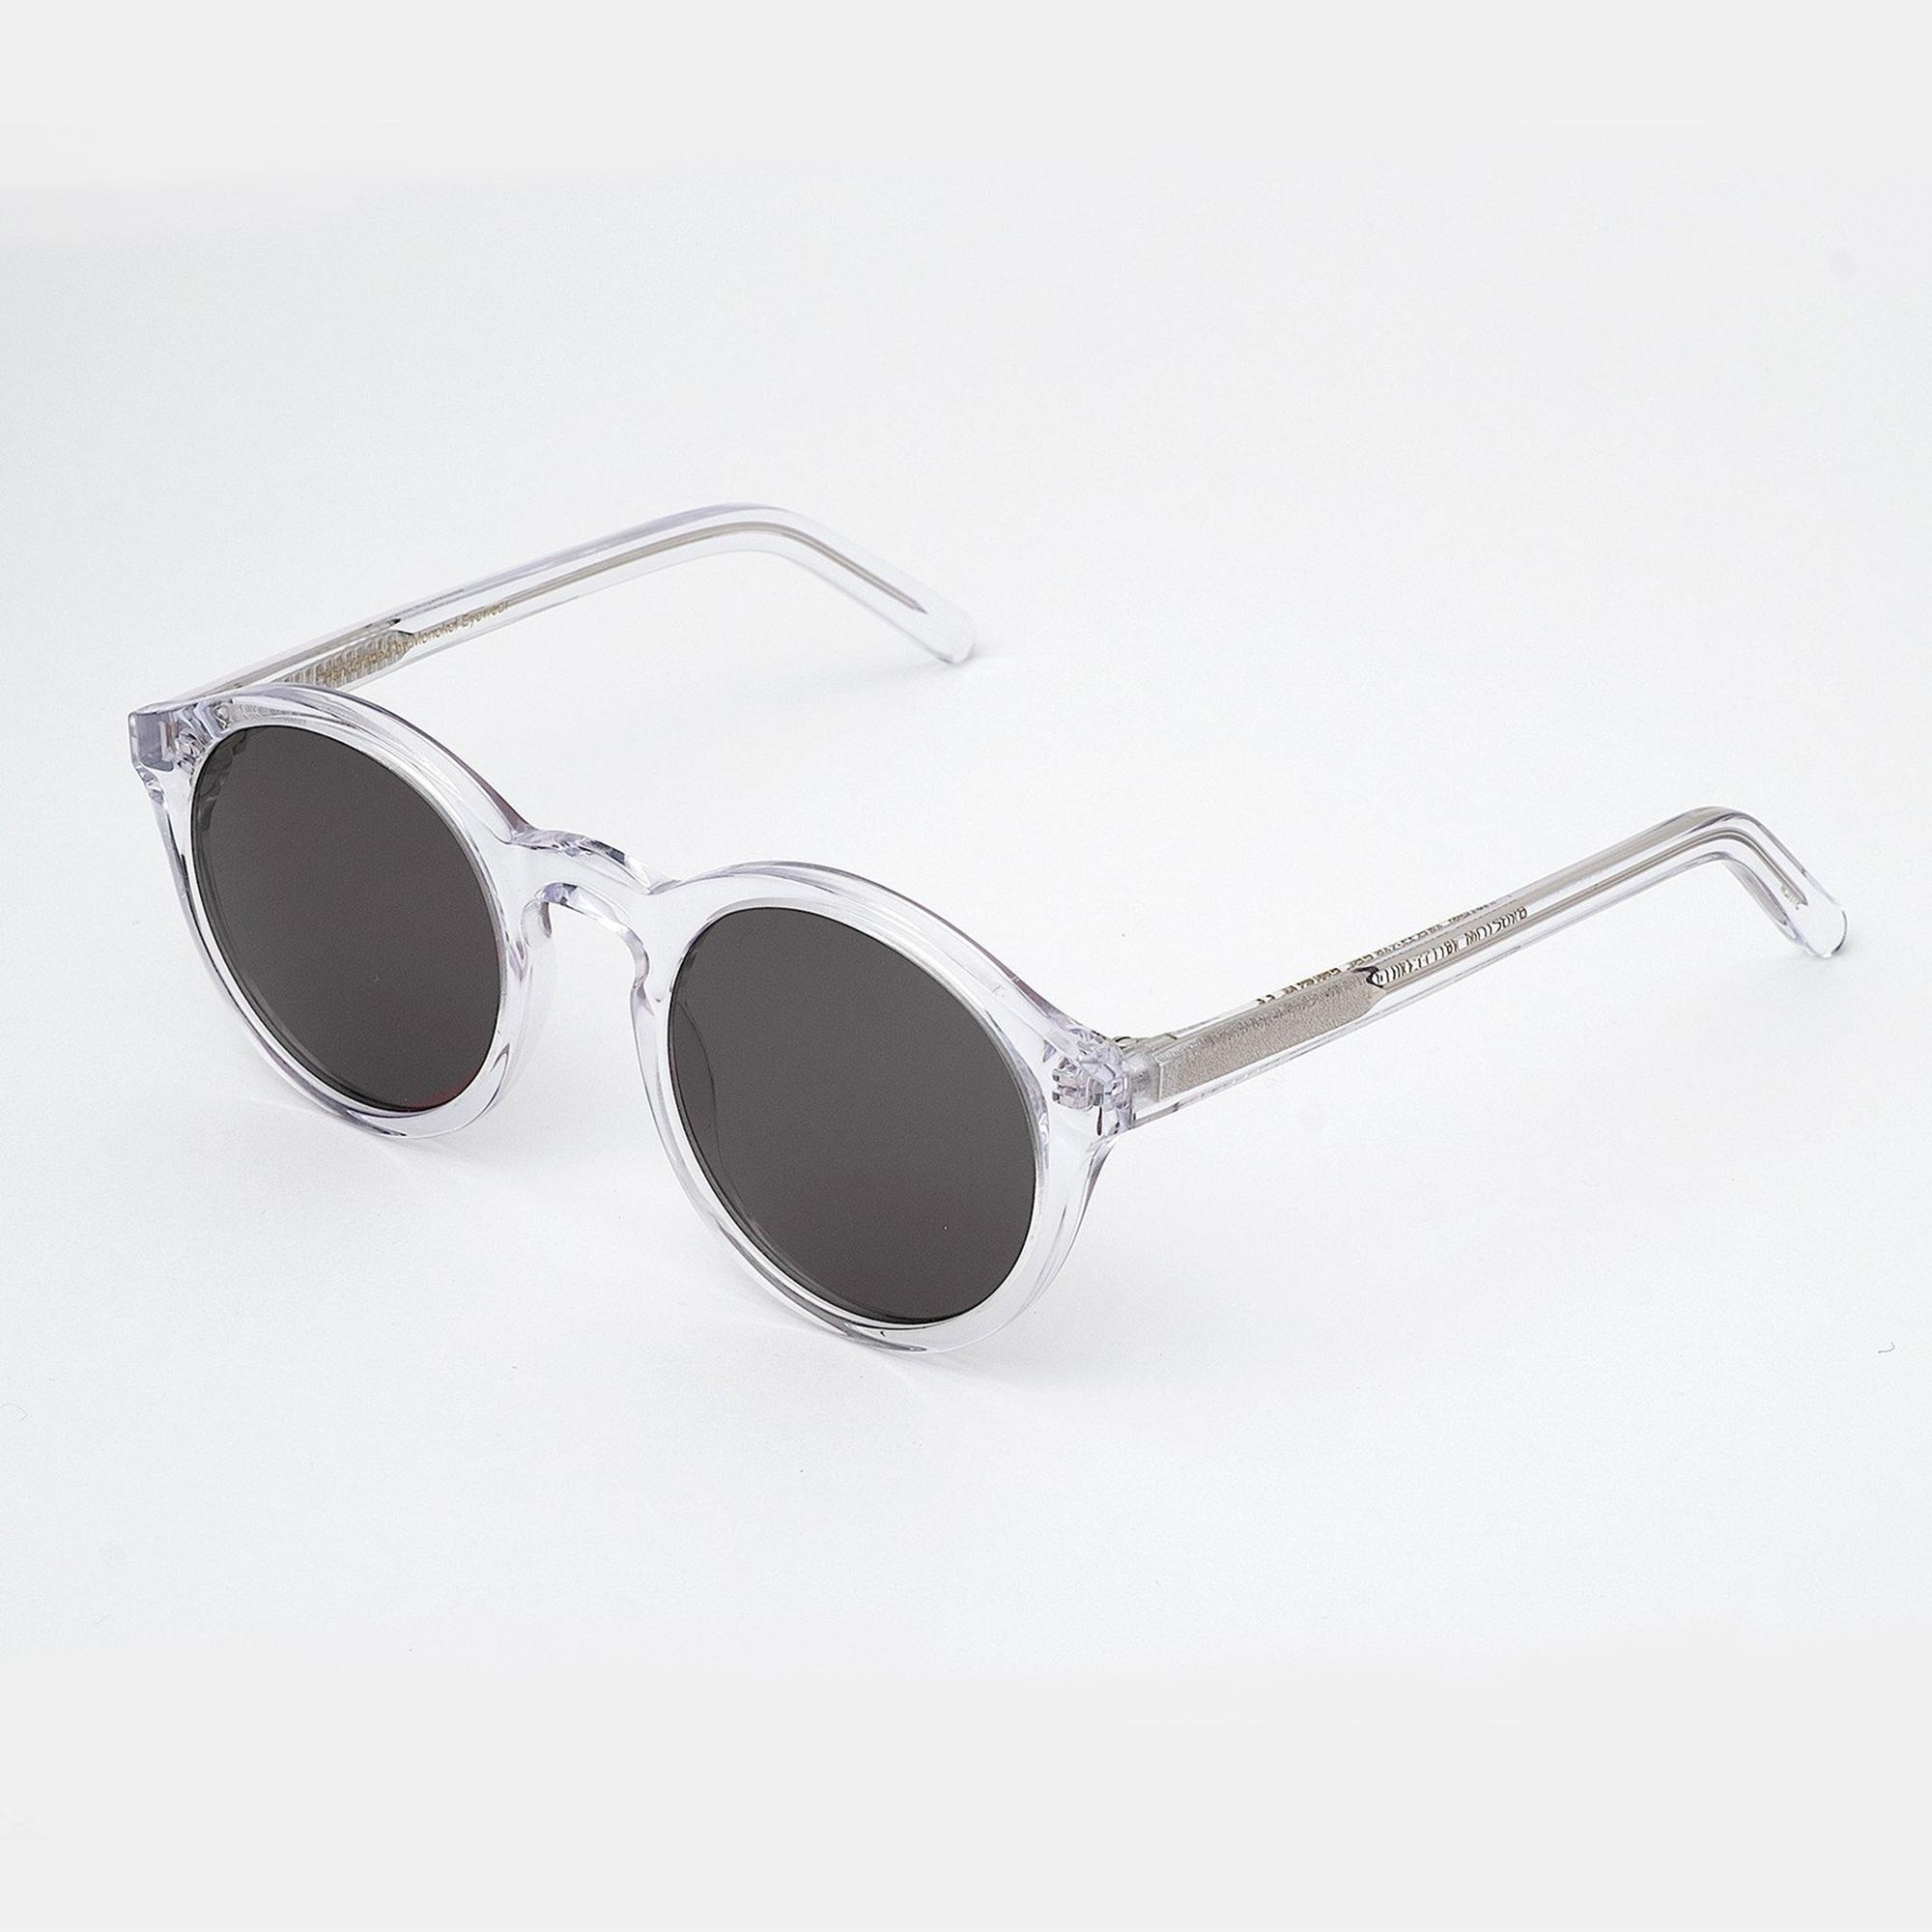 Monokel Leather Barstow Sunglasses for Men